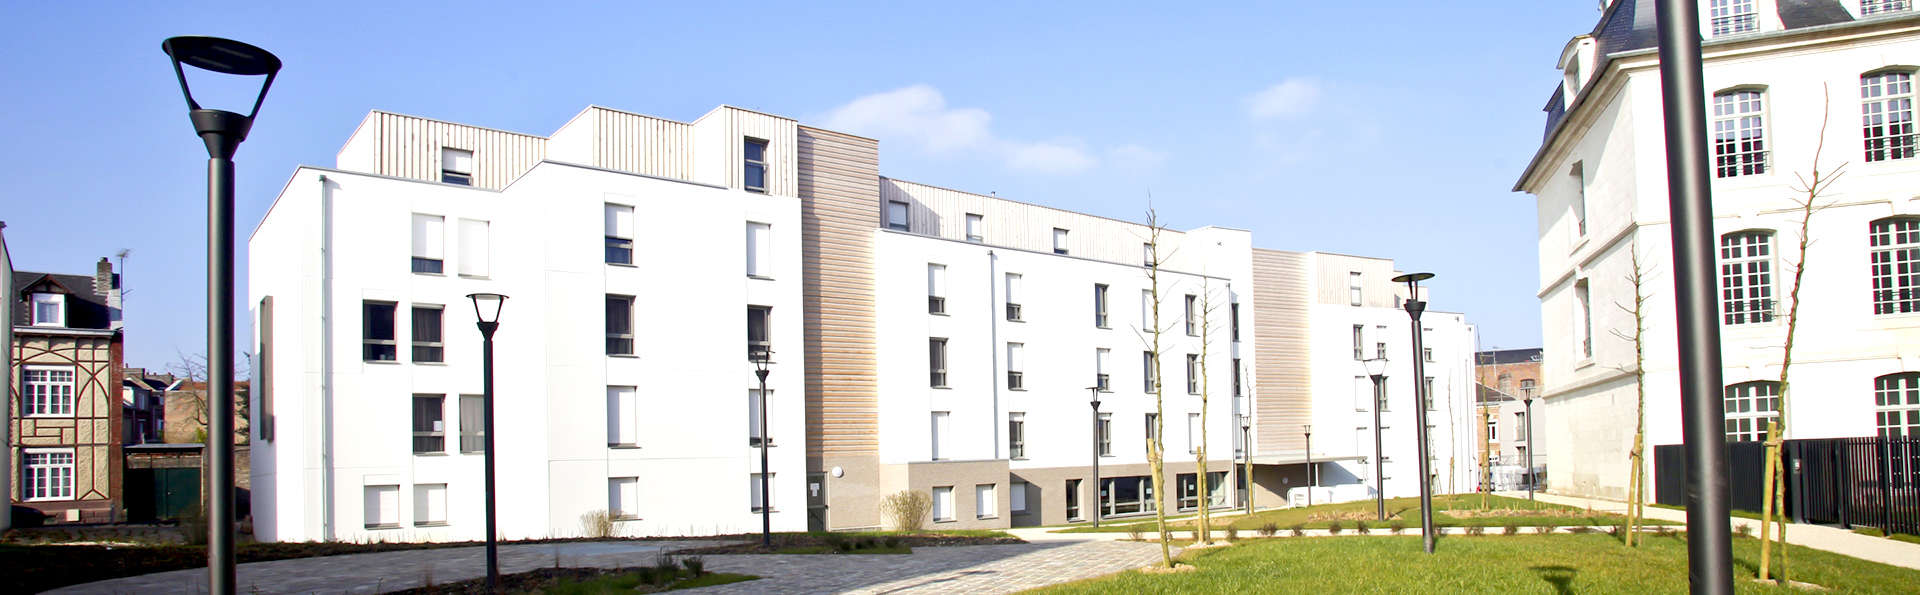 Appart'hôtel Odalys Blamont - Edit_Front.jpg